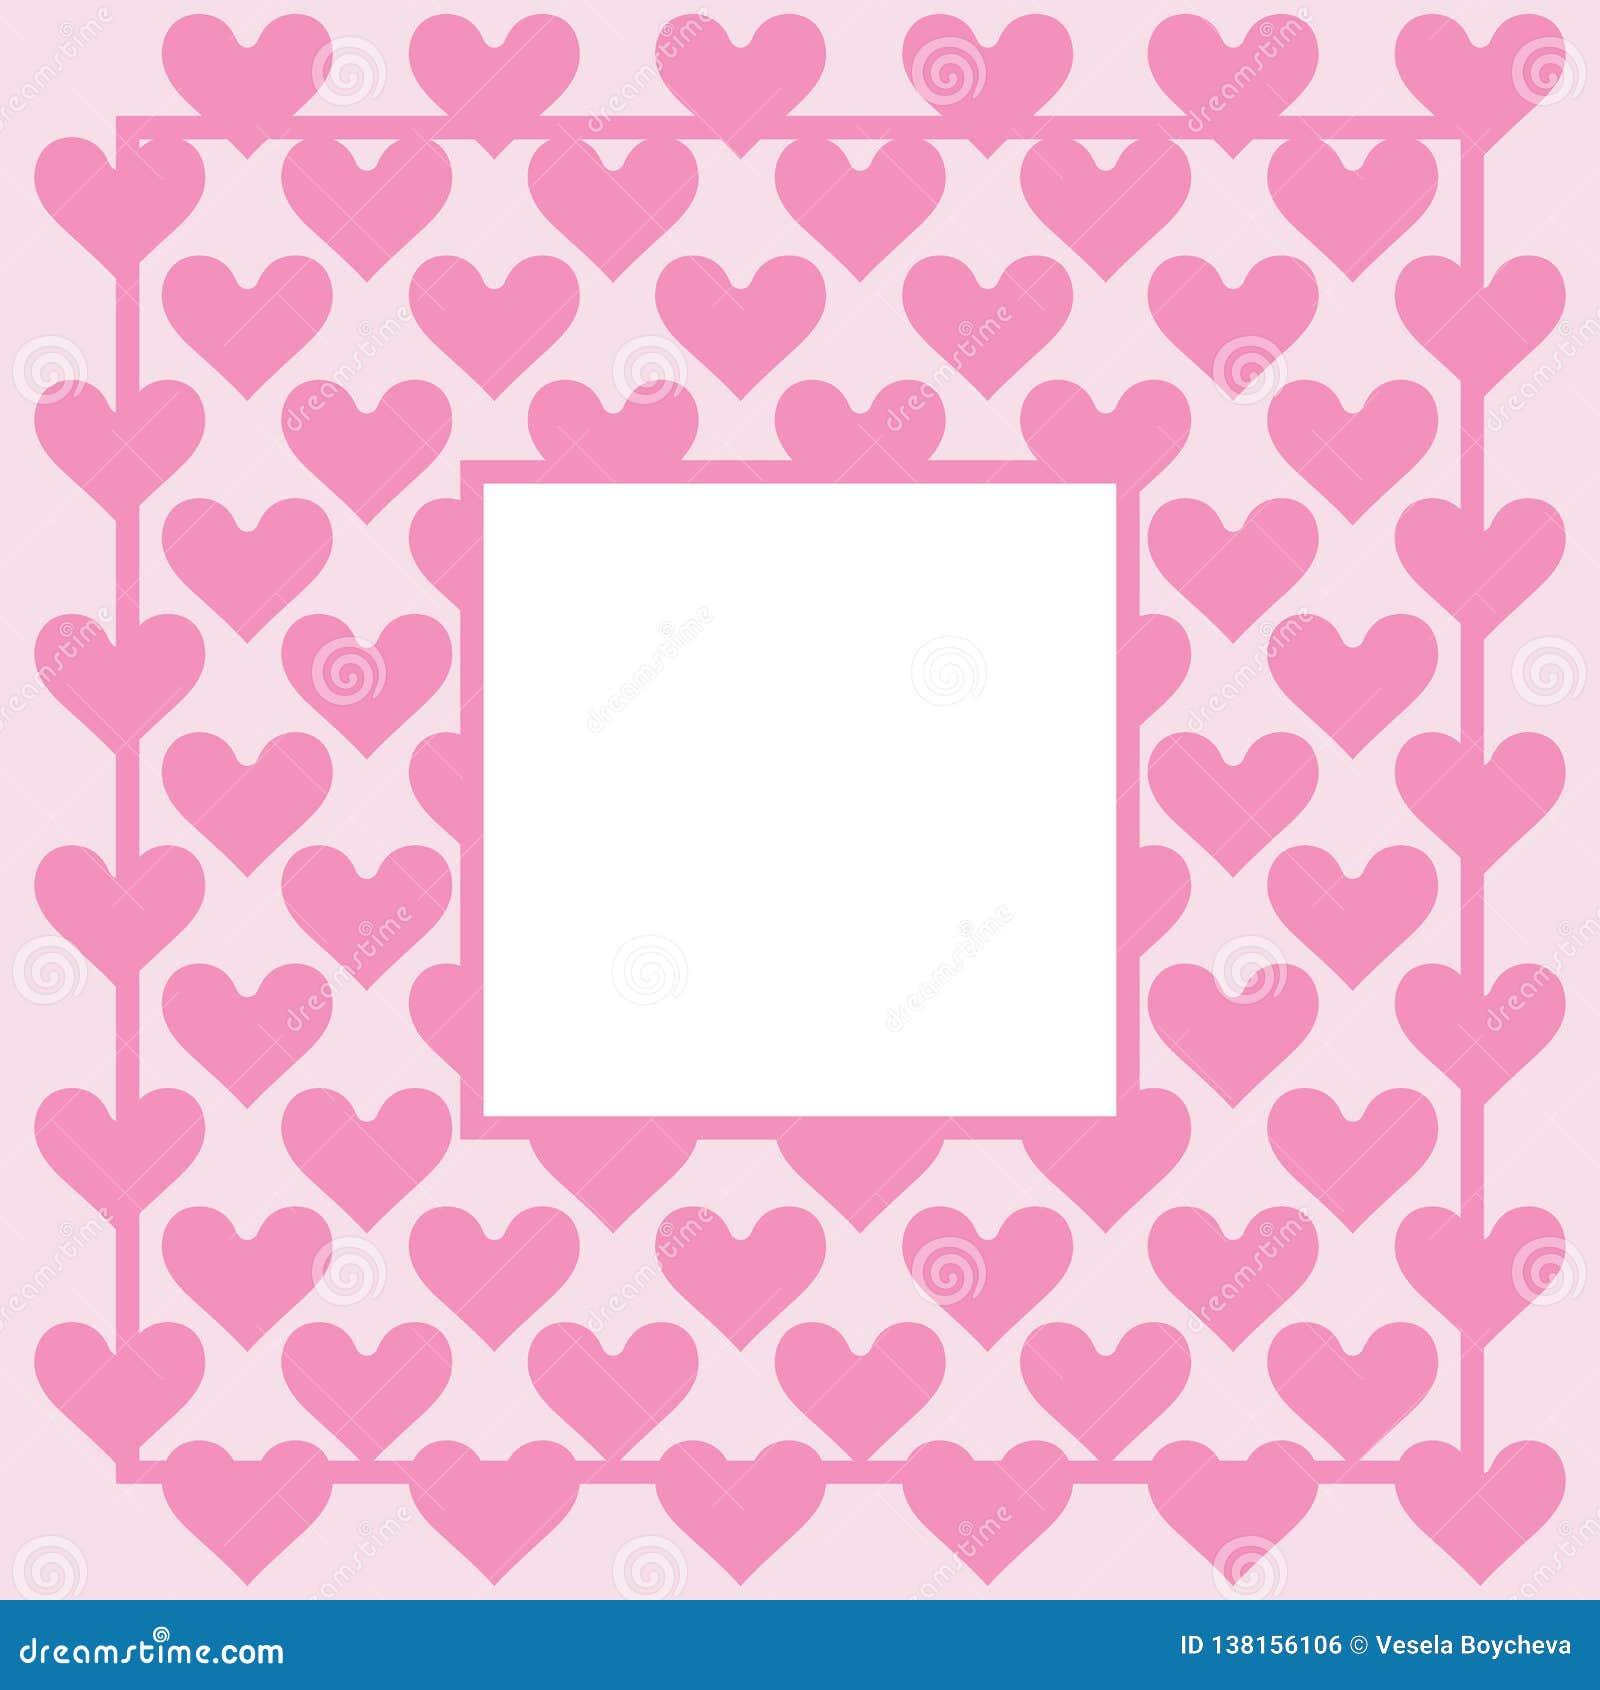 Hearts Background Pattern Hearts St Valentine